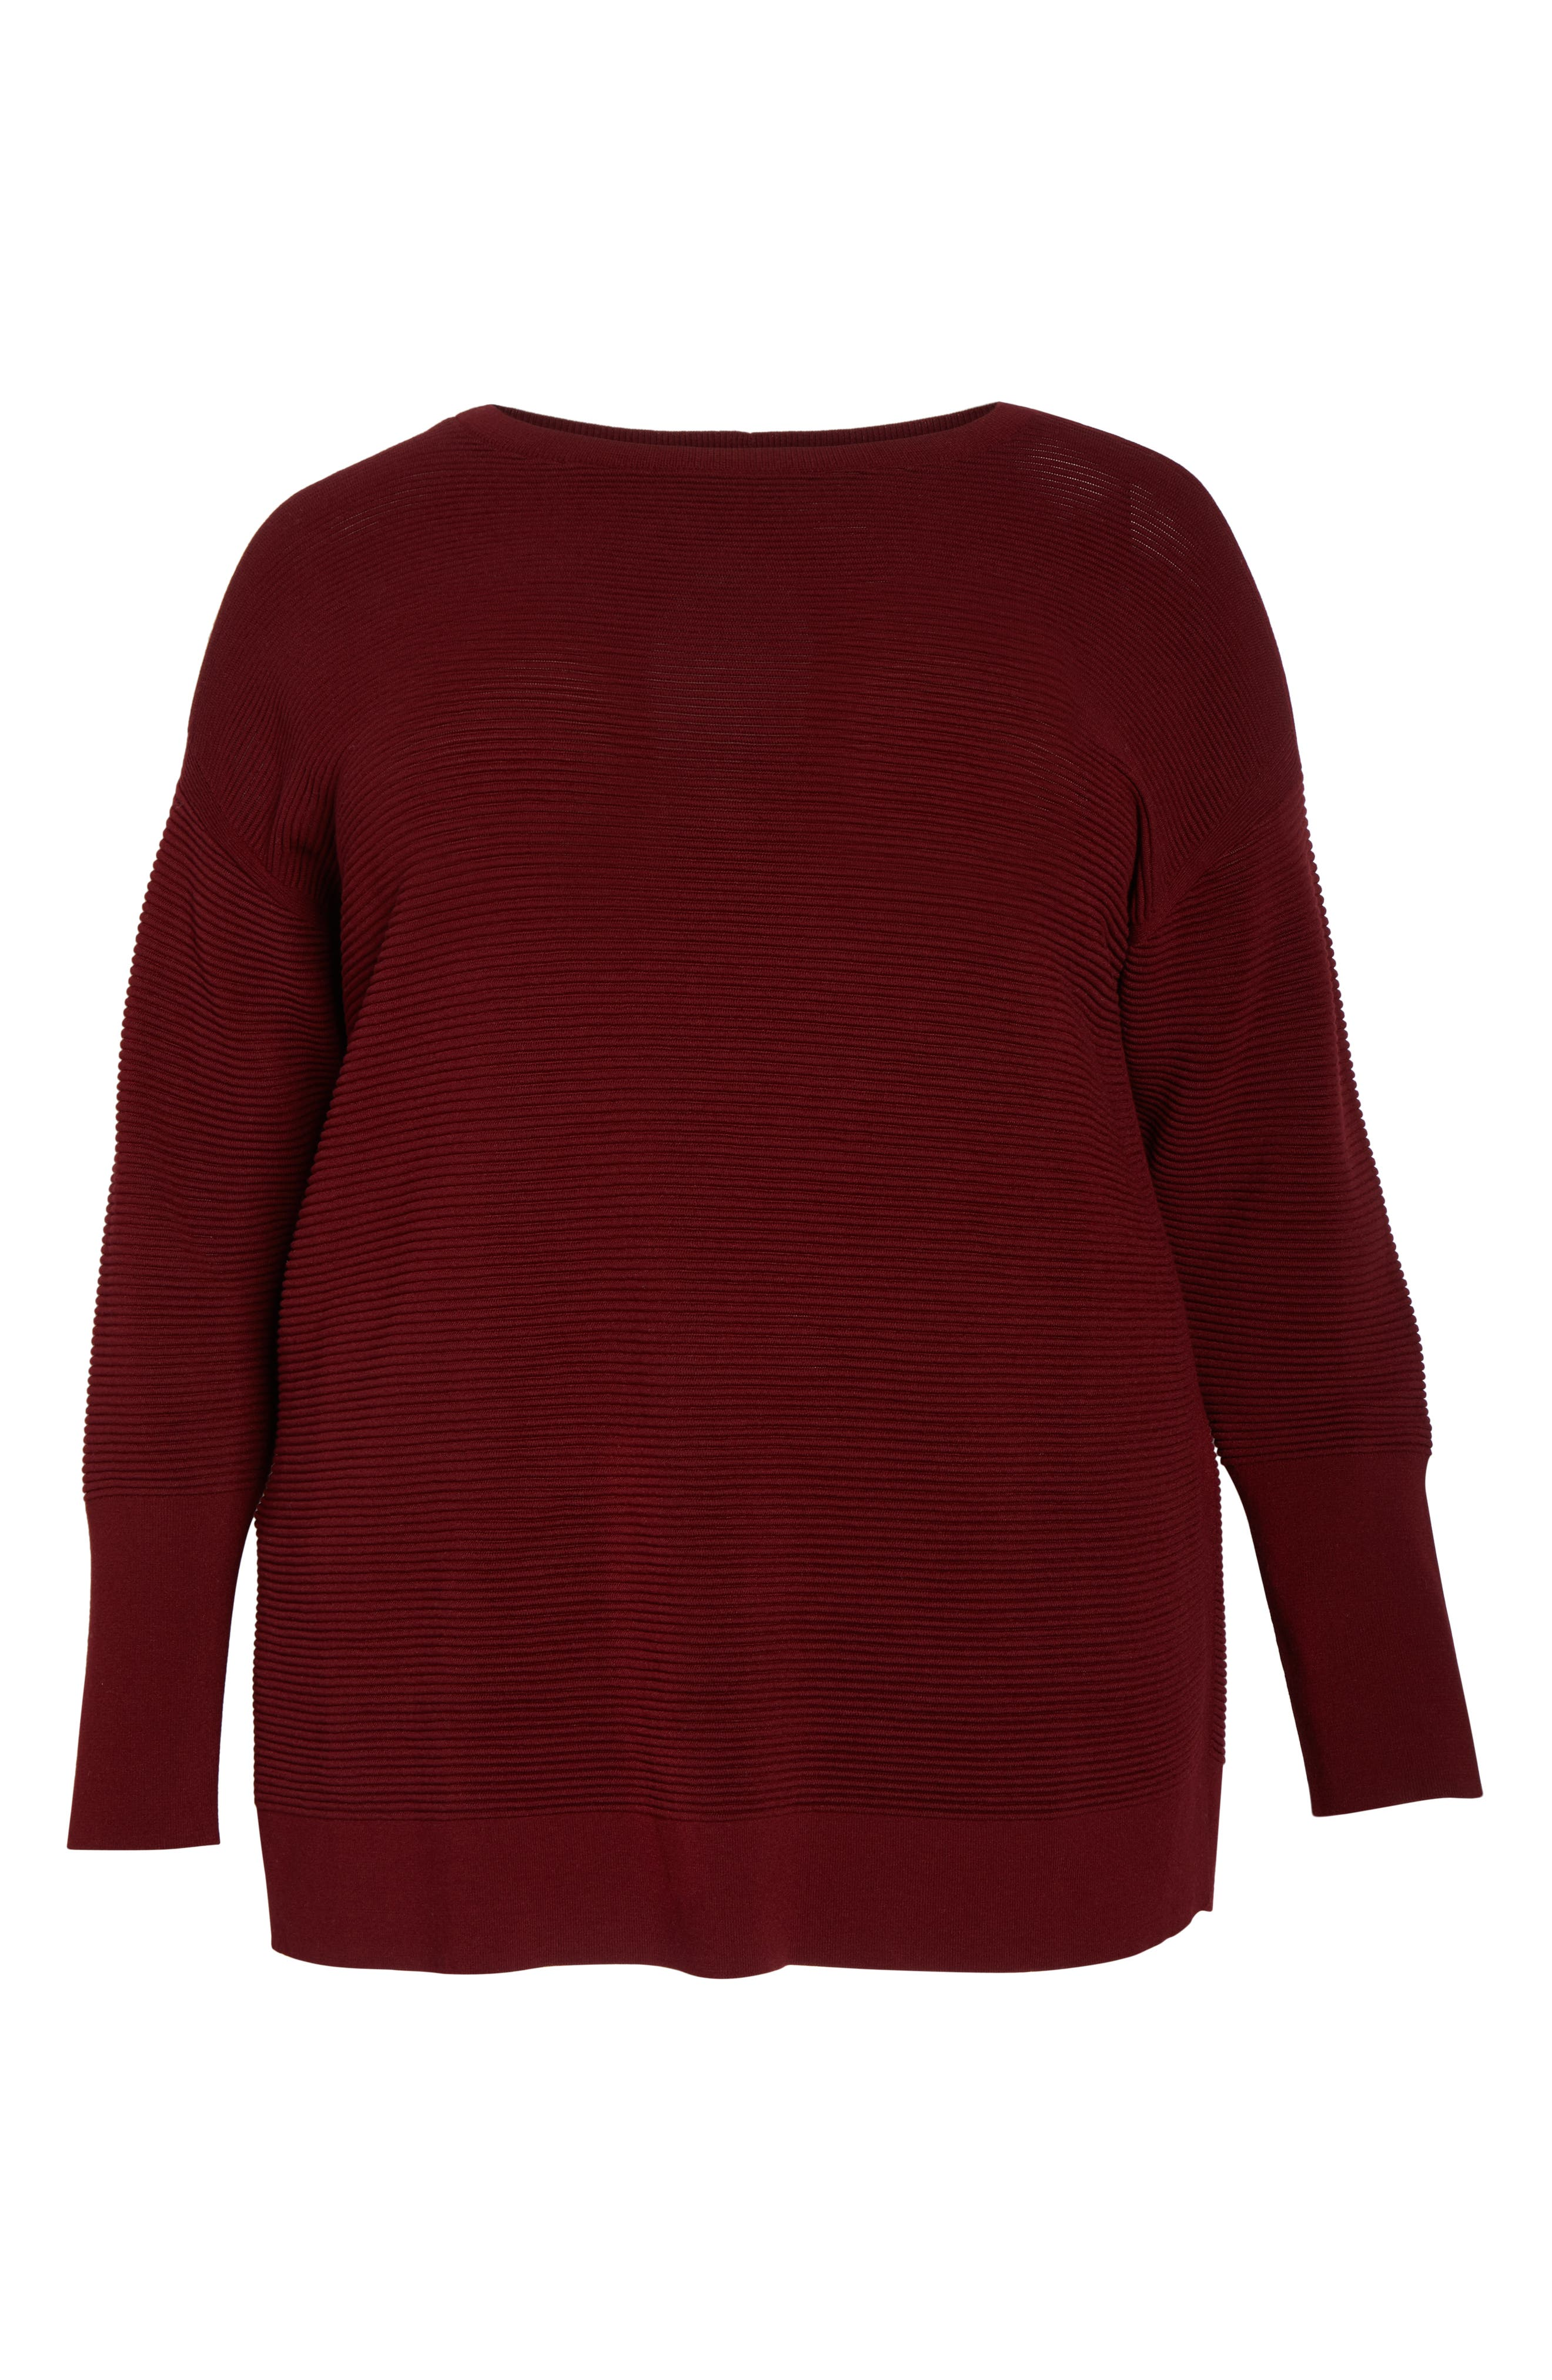 LAFAYETTE 148 NEW YORK,                             Bateau Neck Matte Crepe Sweater,                             Alternate thumbnail 6, color,                             601